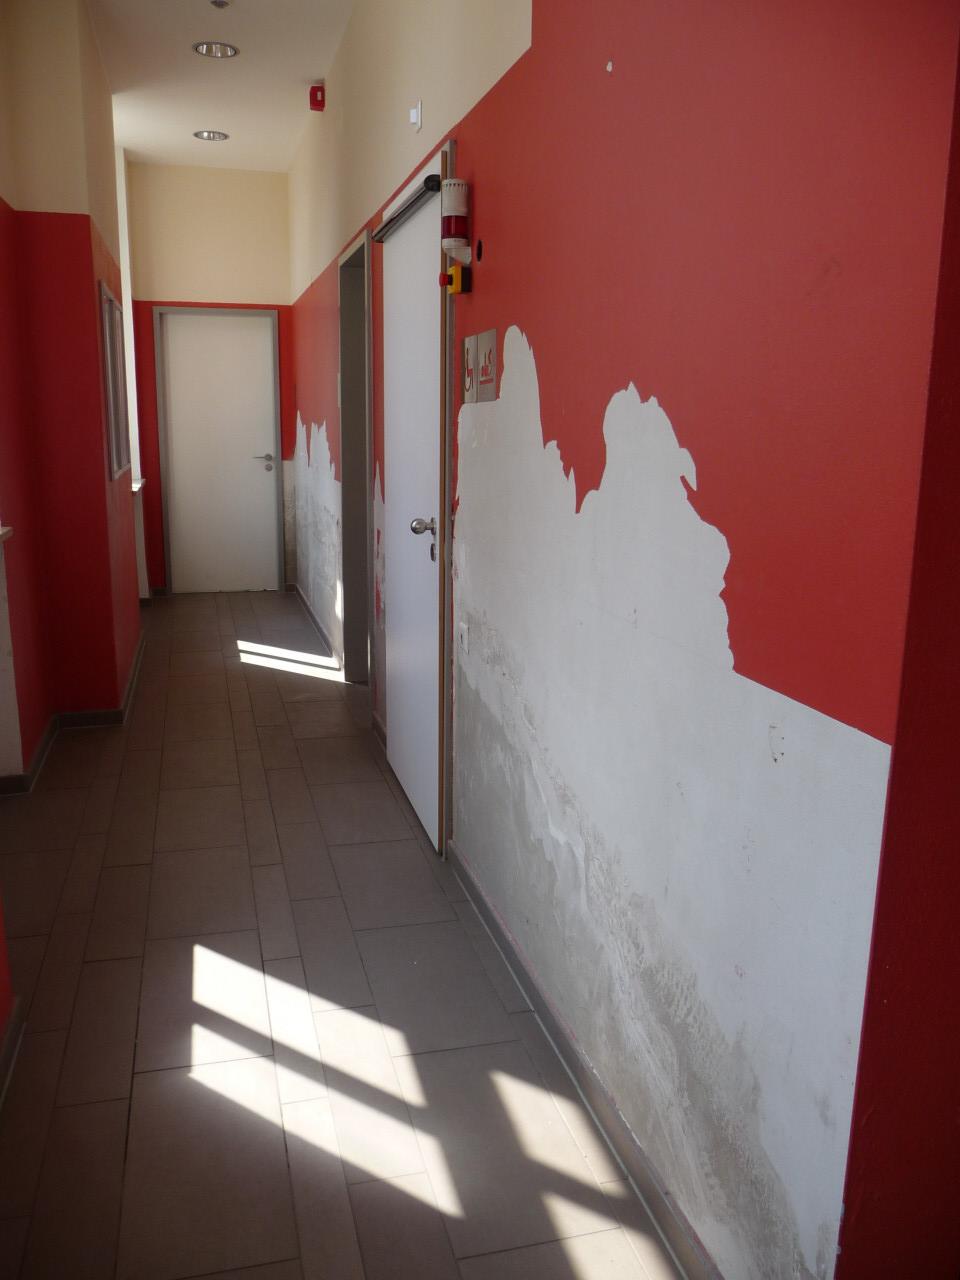 wasserschaden im bahnhof murnau b rgerbahnhof oberland gmbh co kg. Black Bedroom Furniture Sets. Home Design Ideas